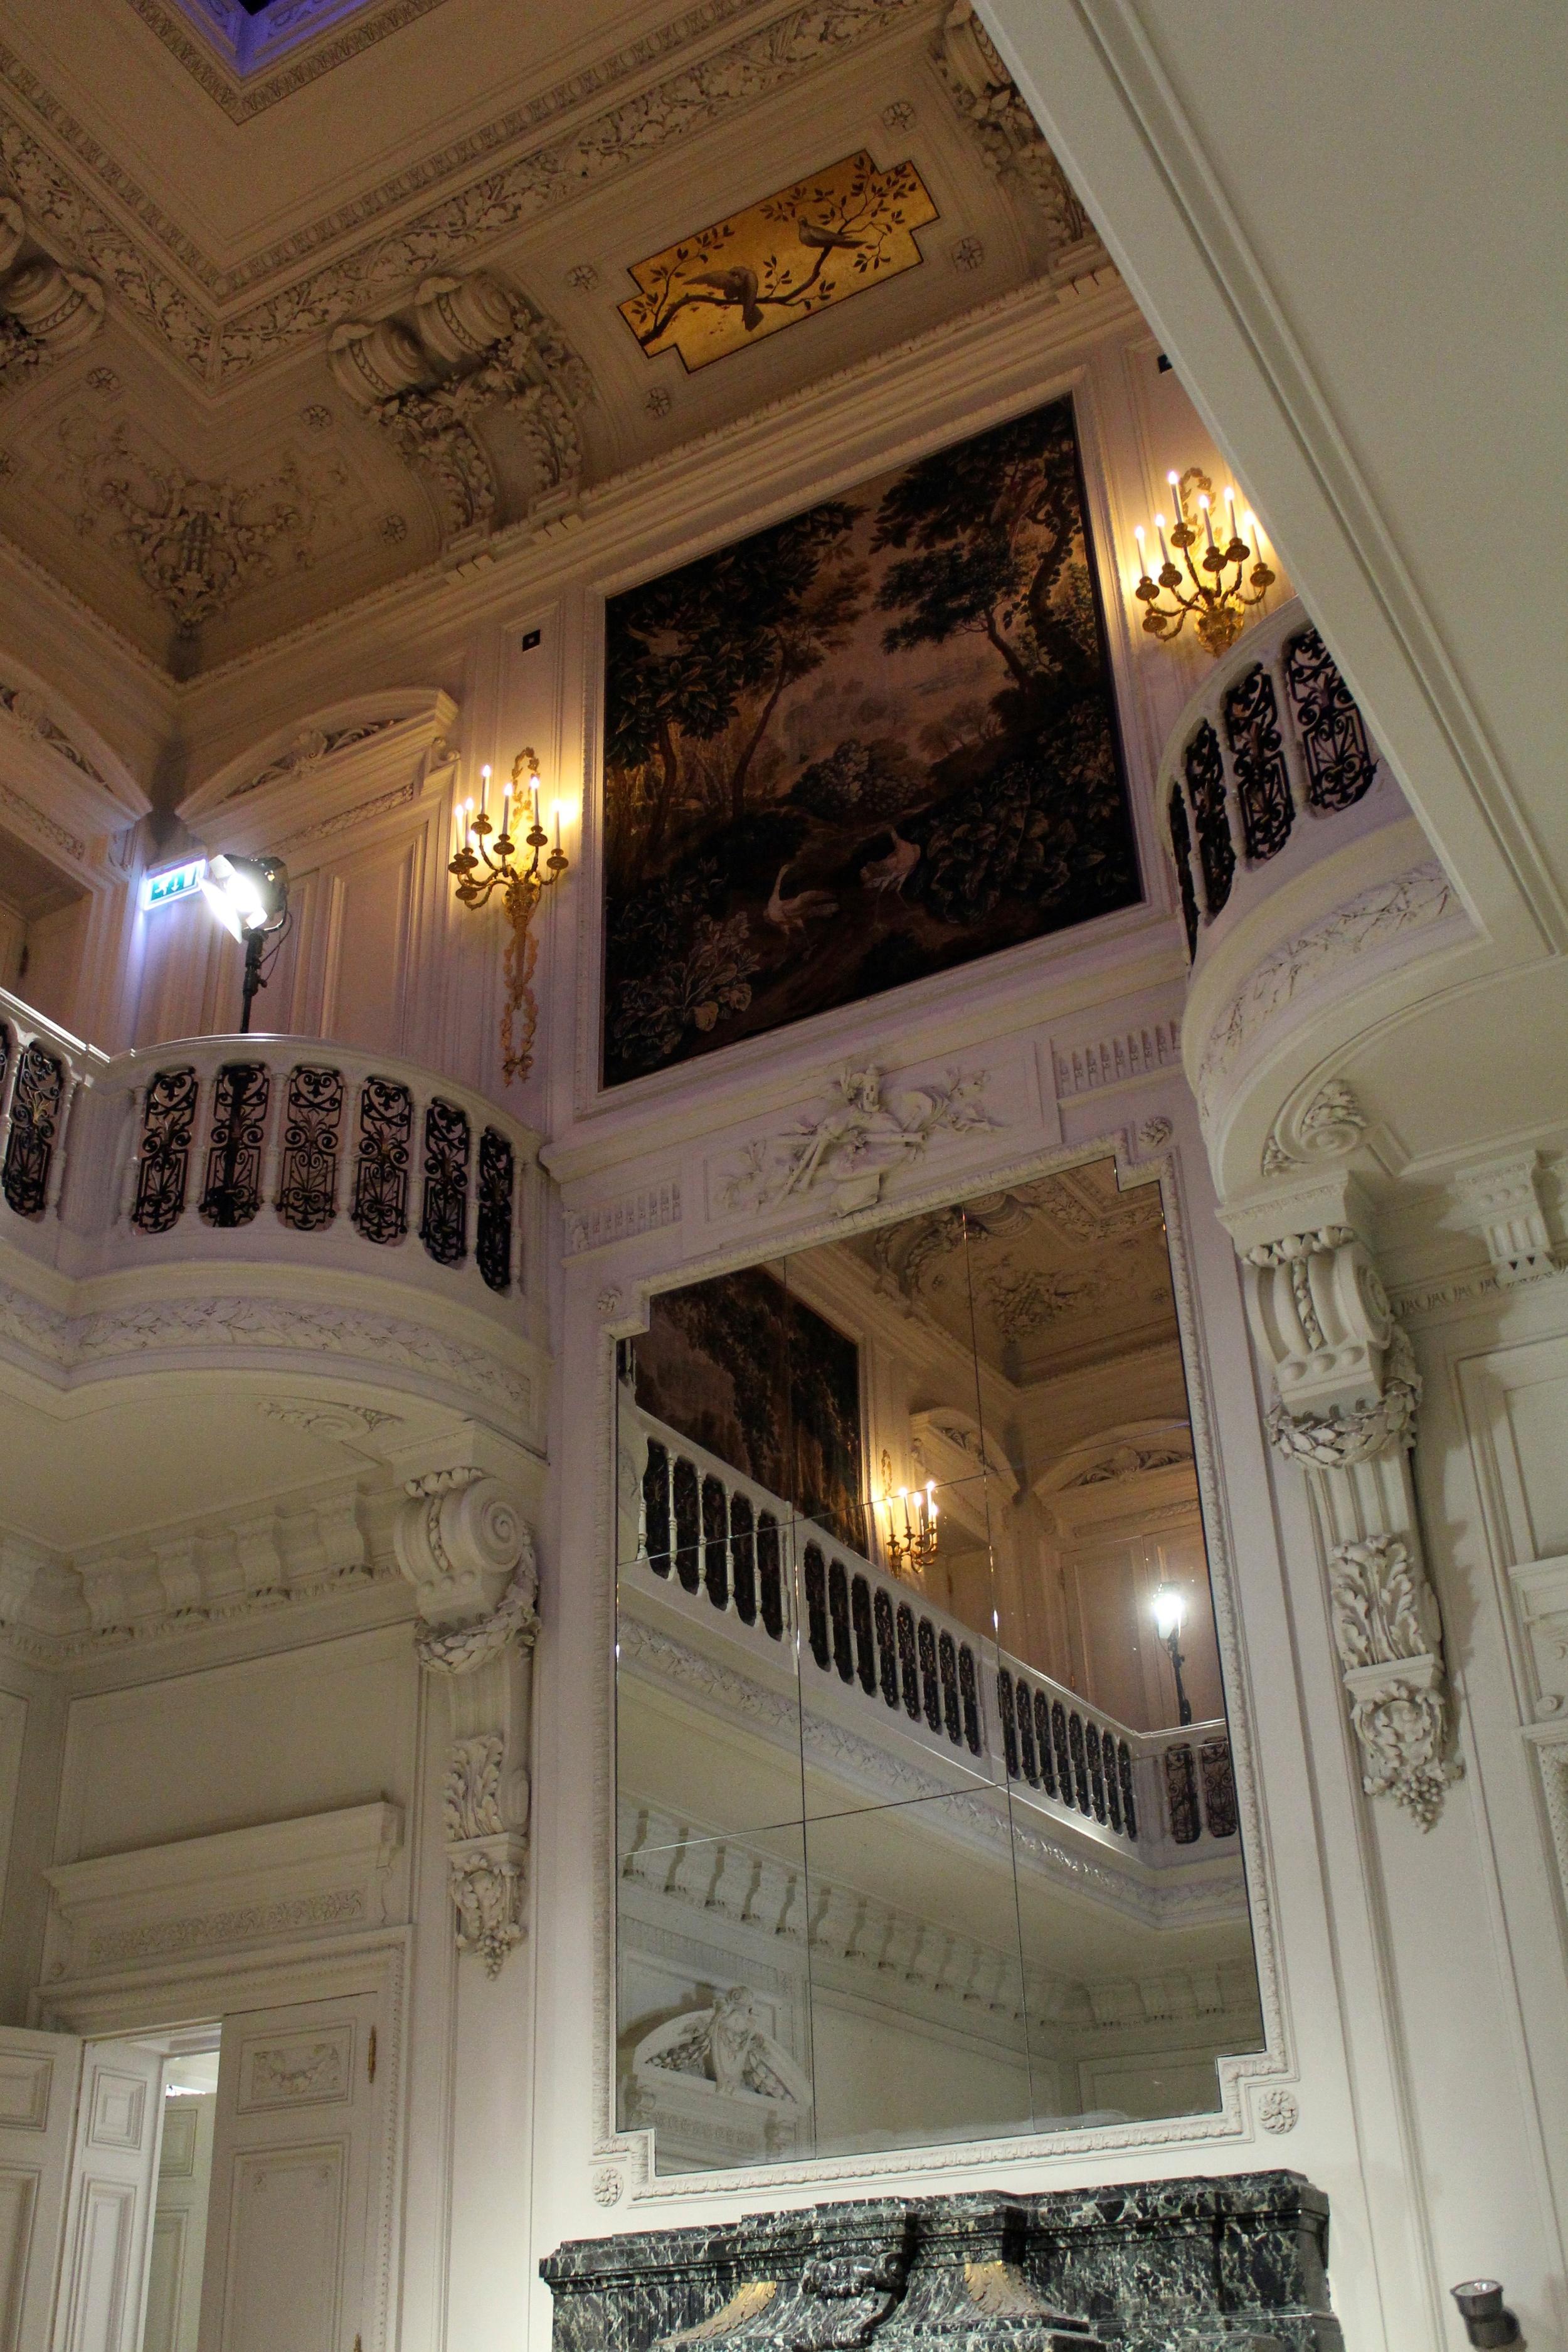 The show took place at the very grand  Hôtel Salomon de Rothschild in Paris